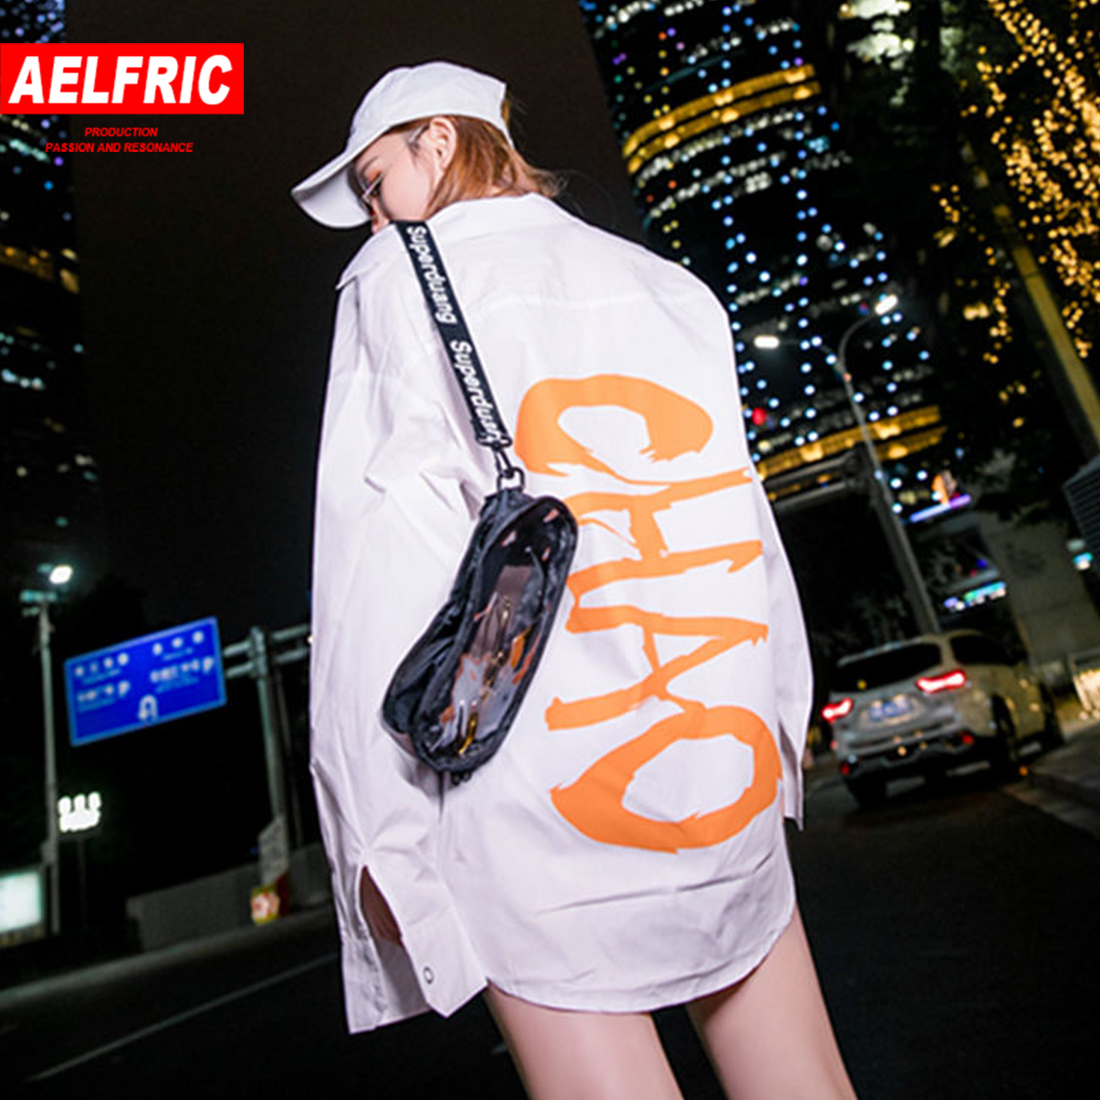 Aelfric Hip Hop Letter Print Long Sleeve Shirts Pockets Patchwork Streetwear 2019 Women Harajuku Fashion Casual Cowboy Blouse